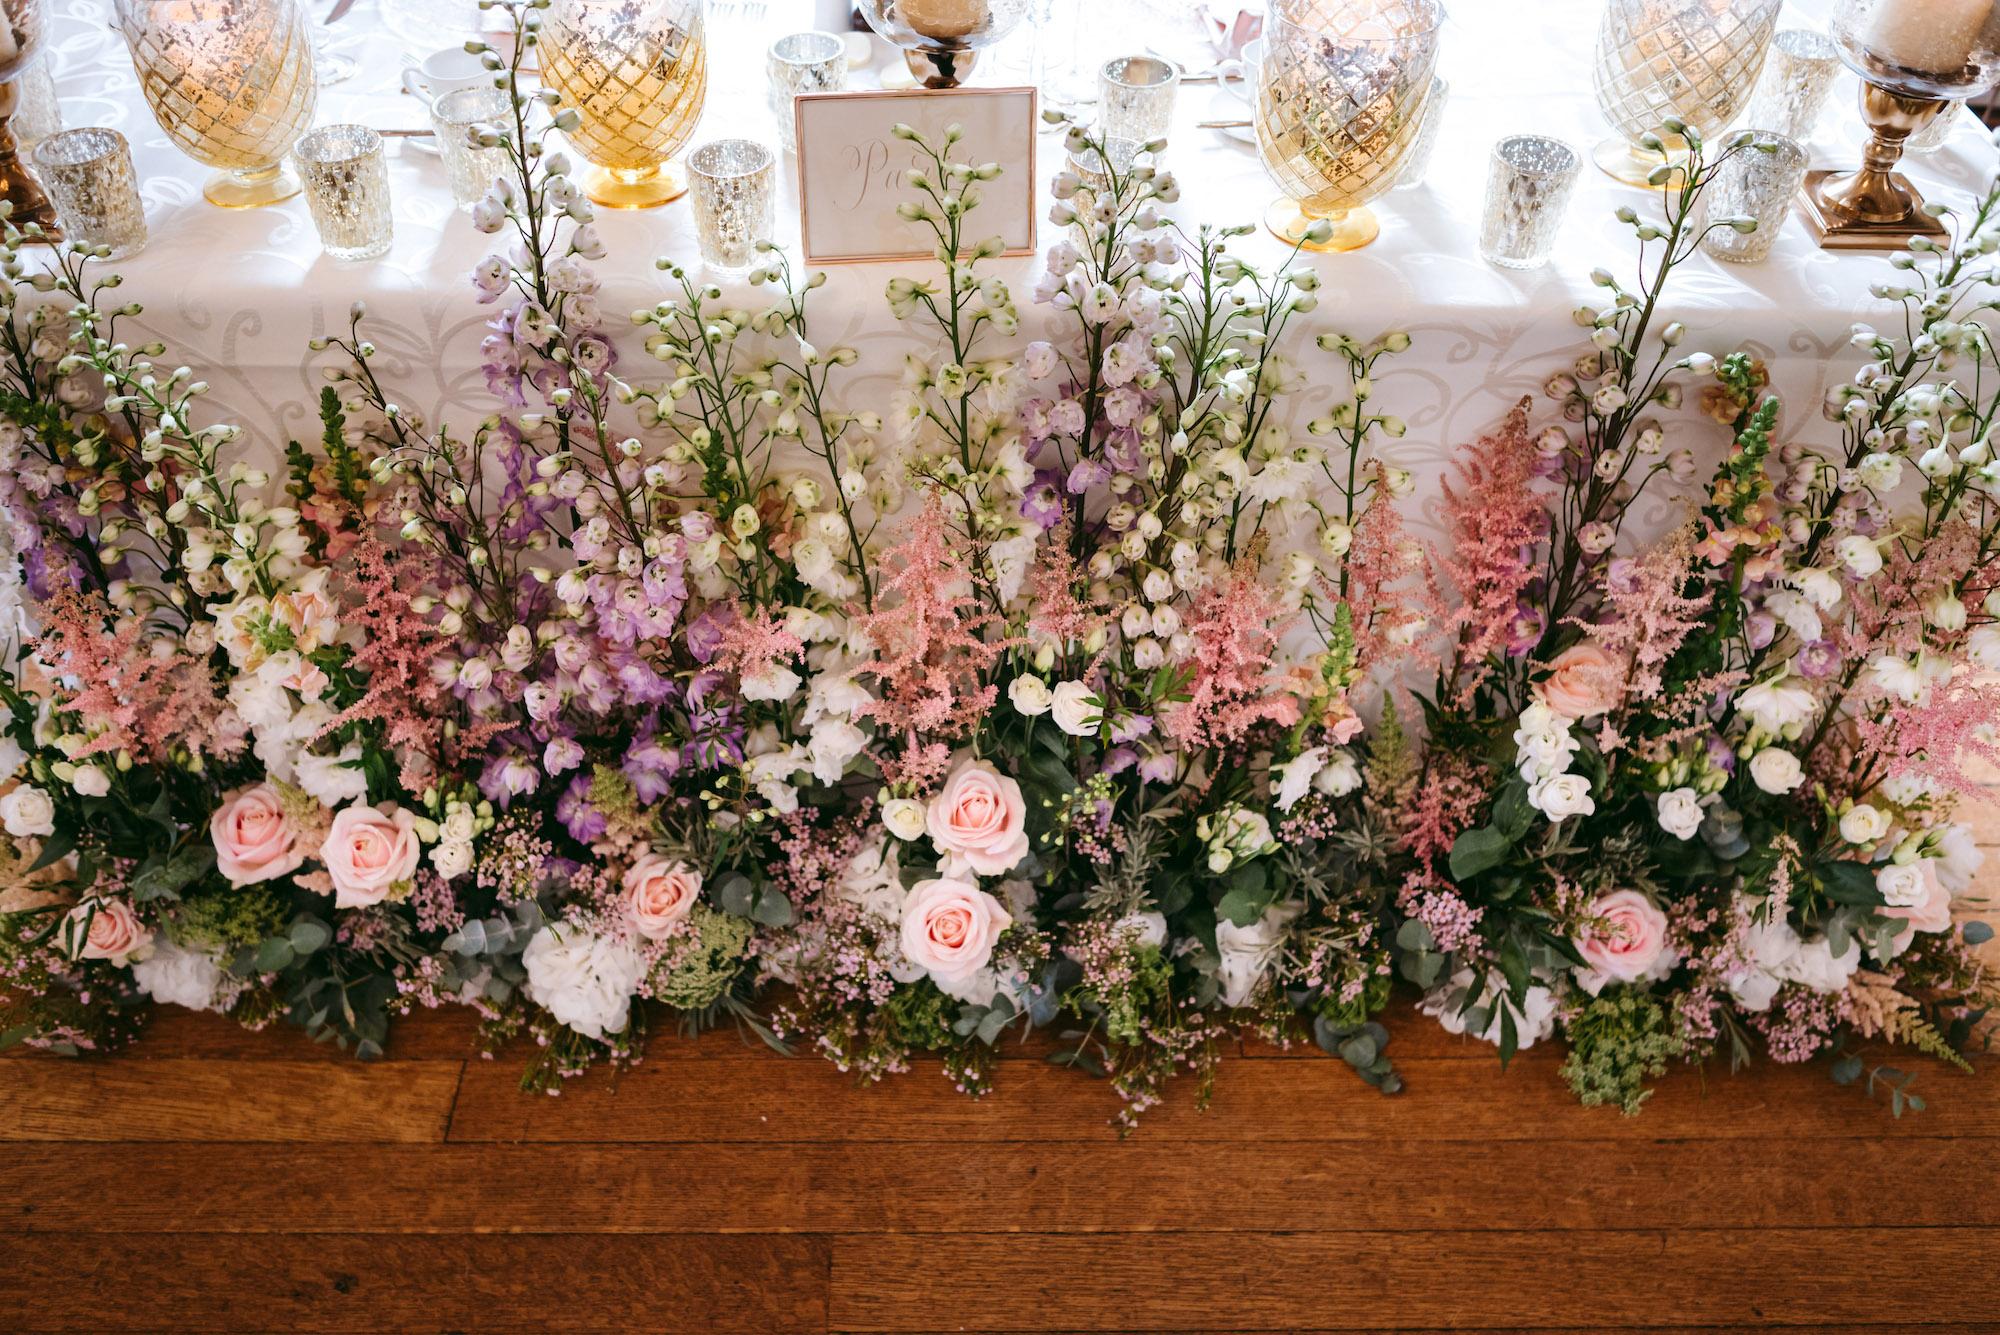 66b   Hengrave Hall Wedding   Suffolk Wedding   Lamare London   Luxury Wedding Planner   Jon Mold Photography.jpg